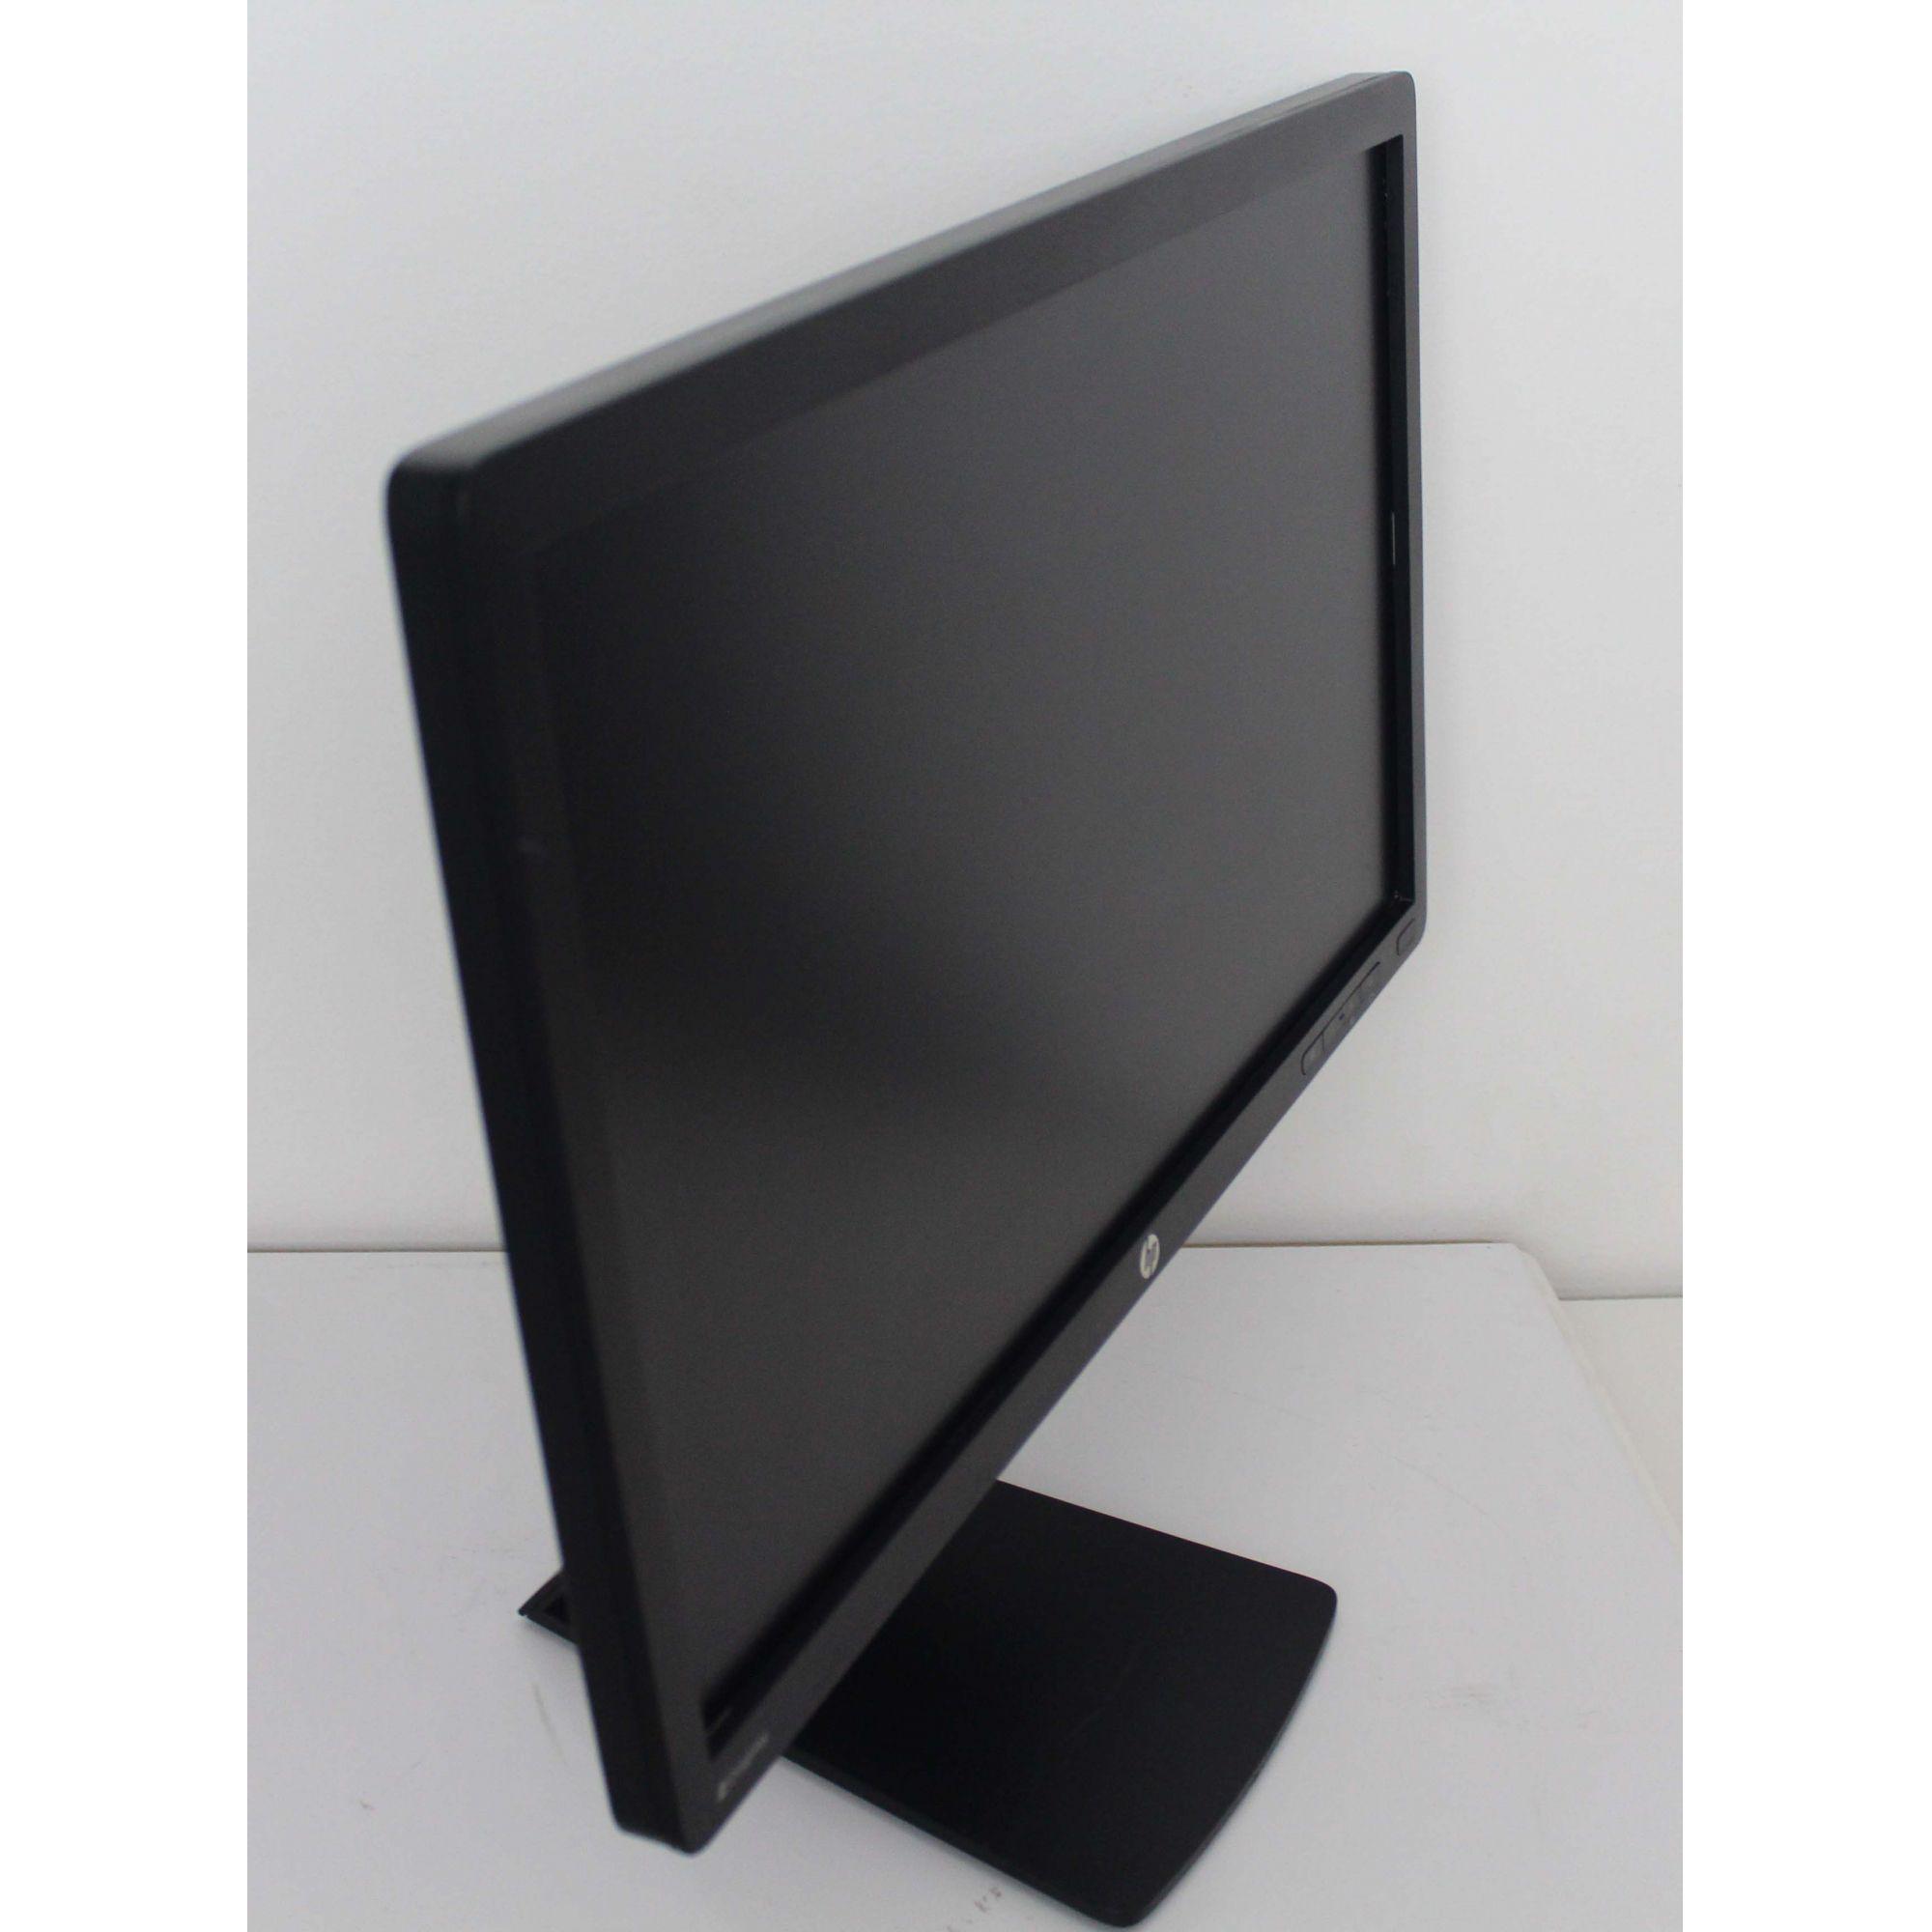 "Monitor HP Empresarial Z22i 21.5"" FULL HD-LED"